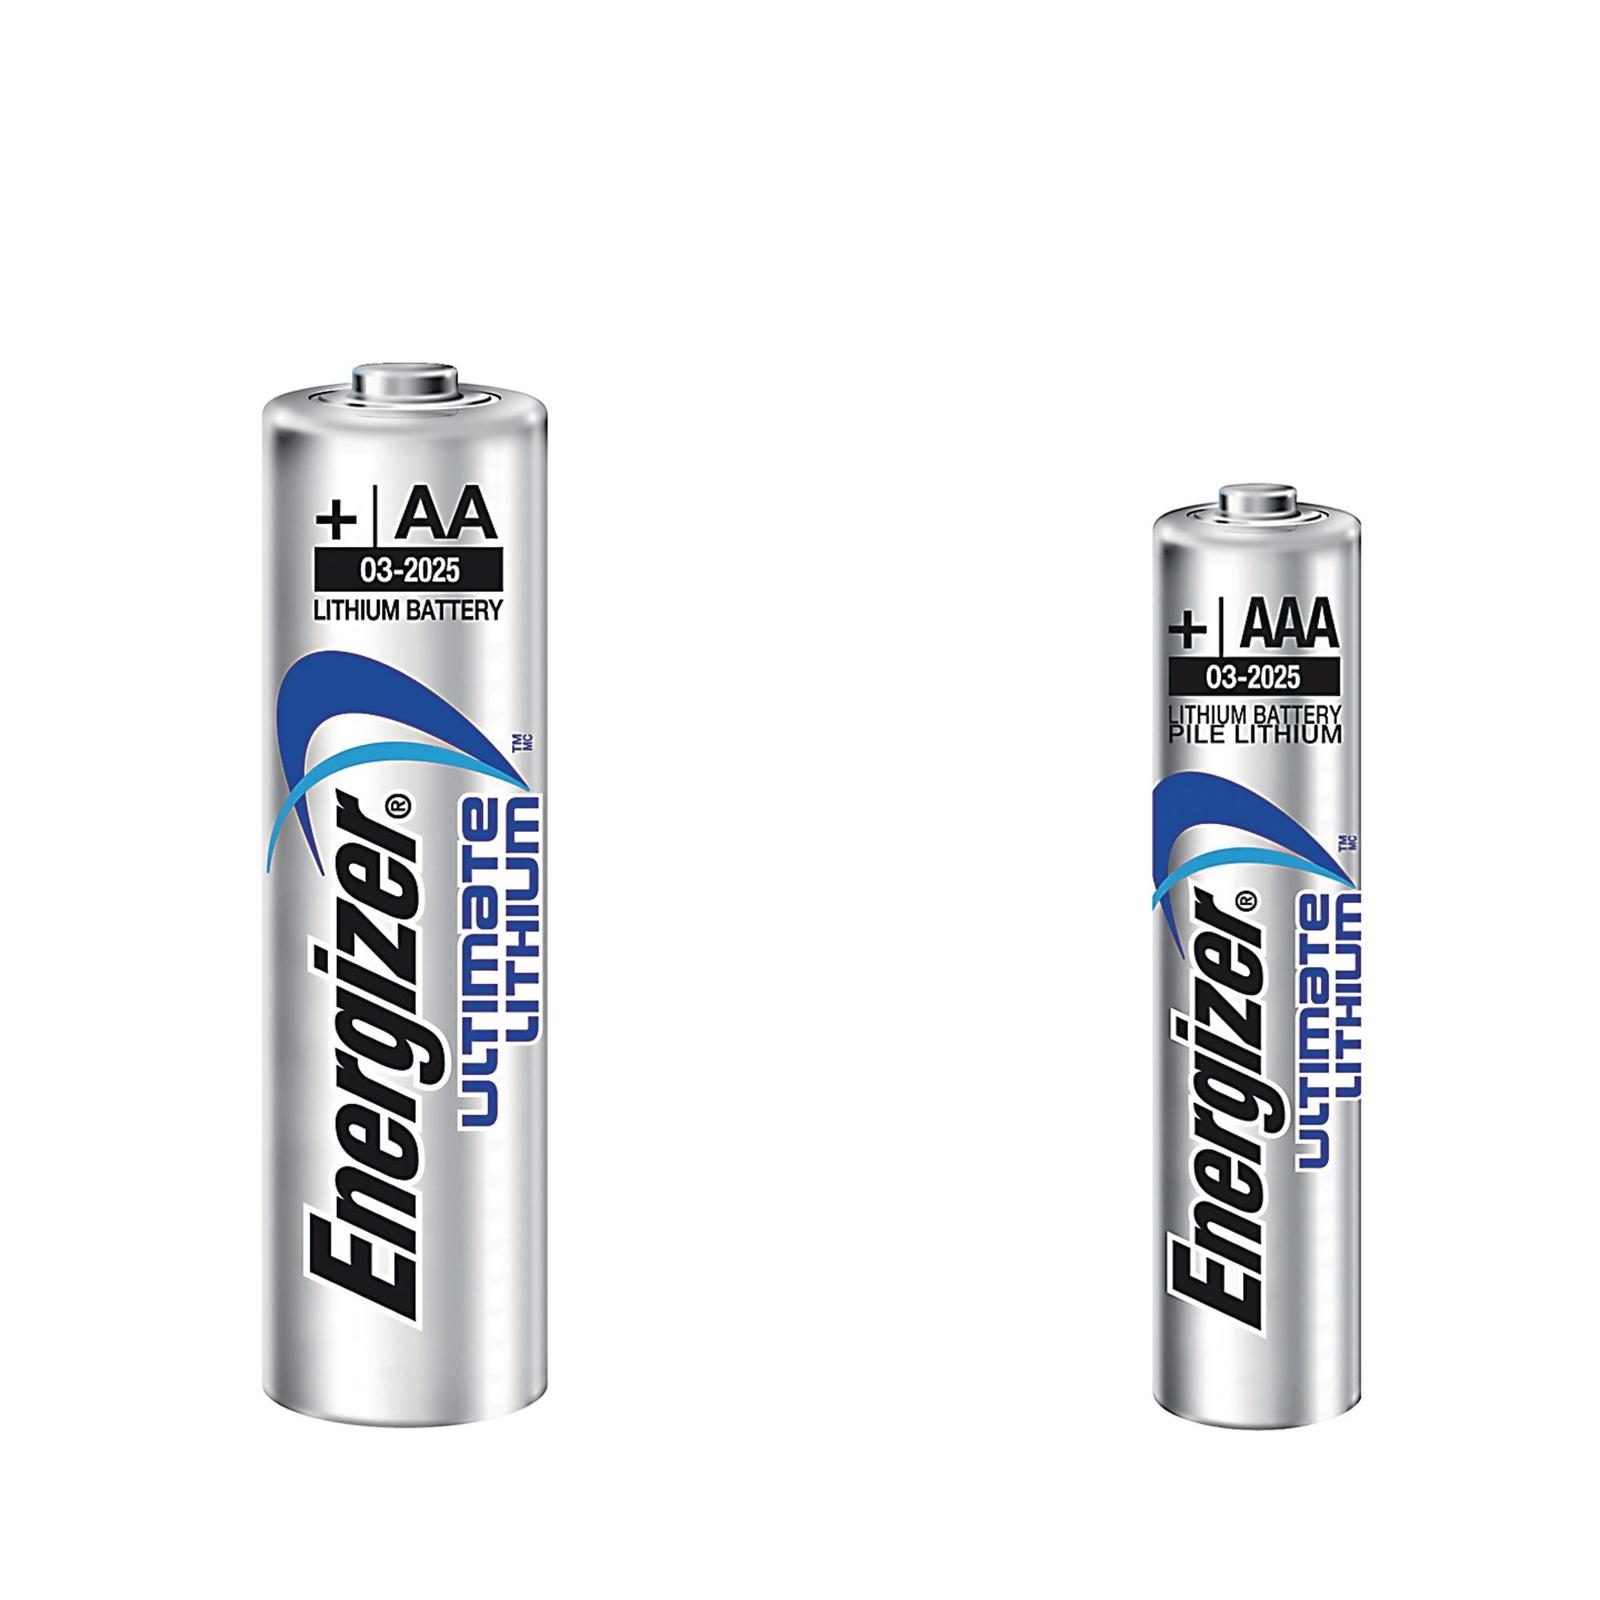 Energizer Lithium for Digital Cameras - AA, LR6